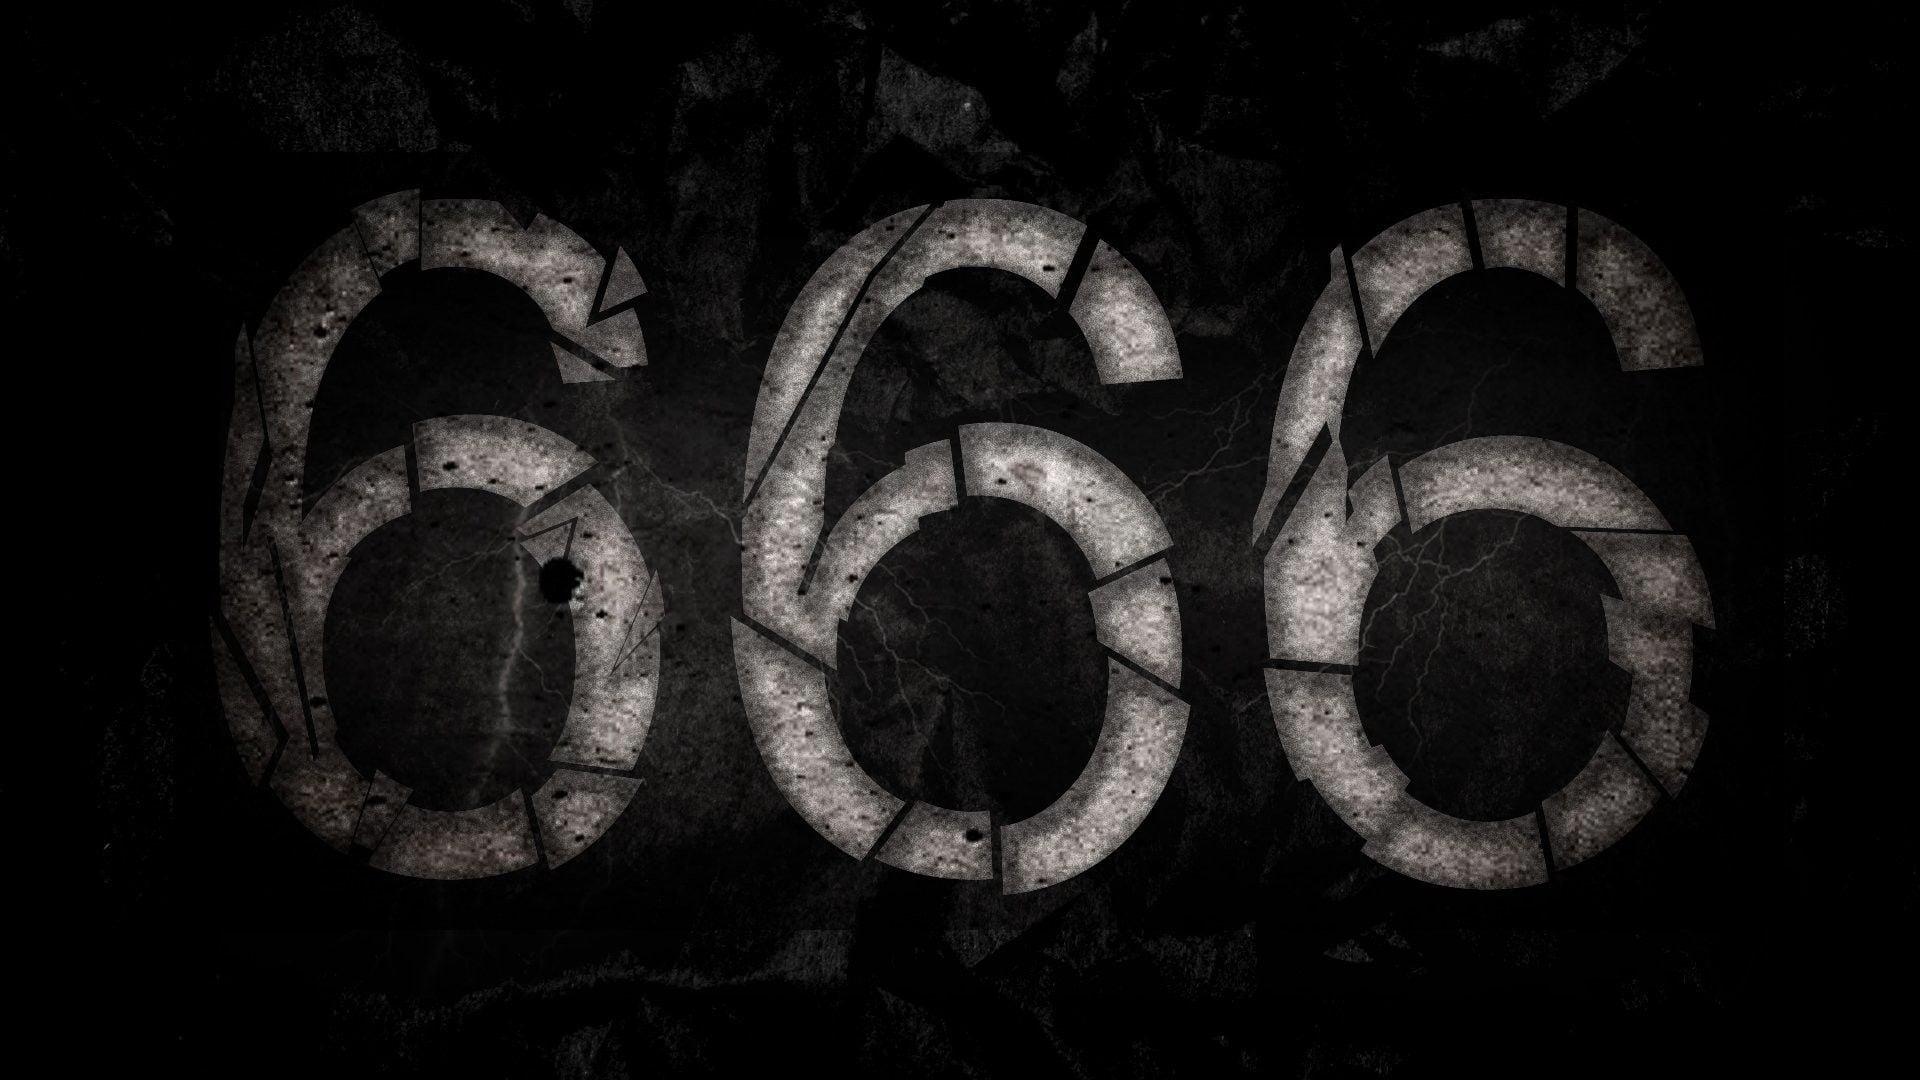 wallpaper 666